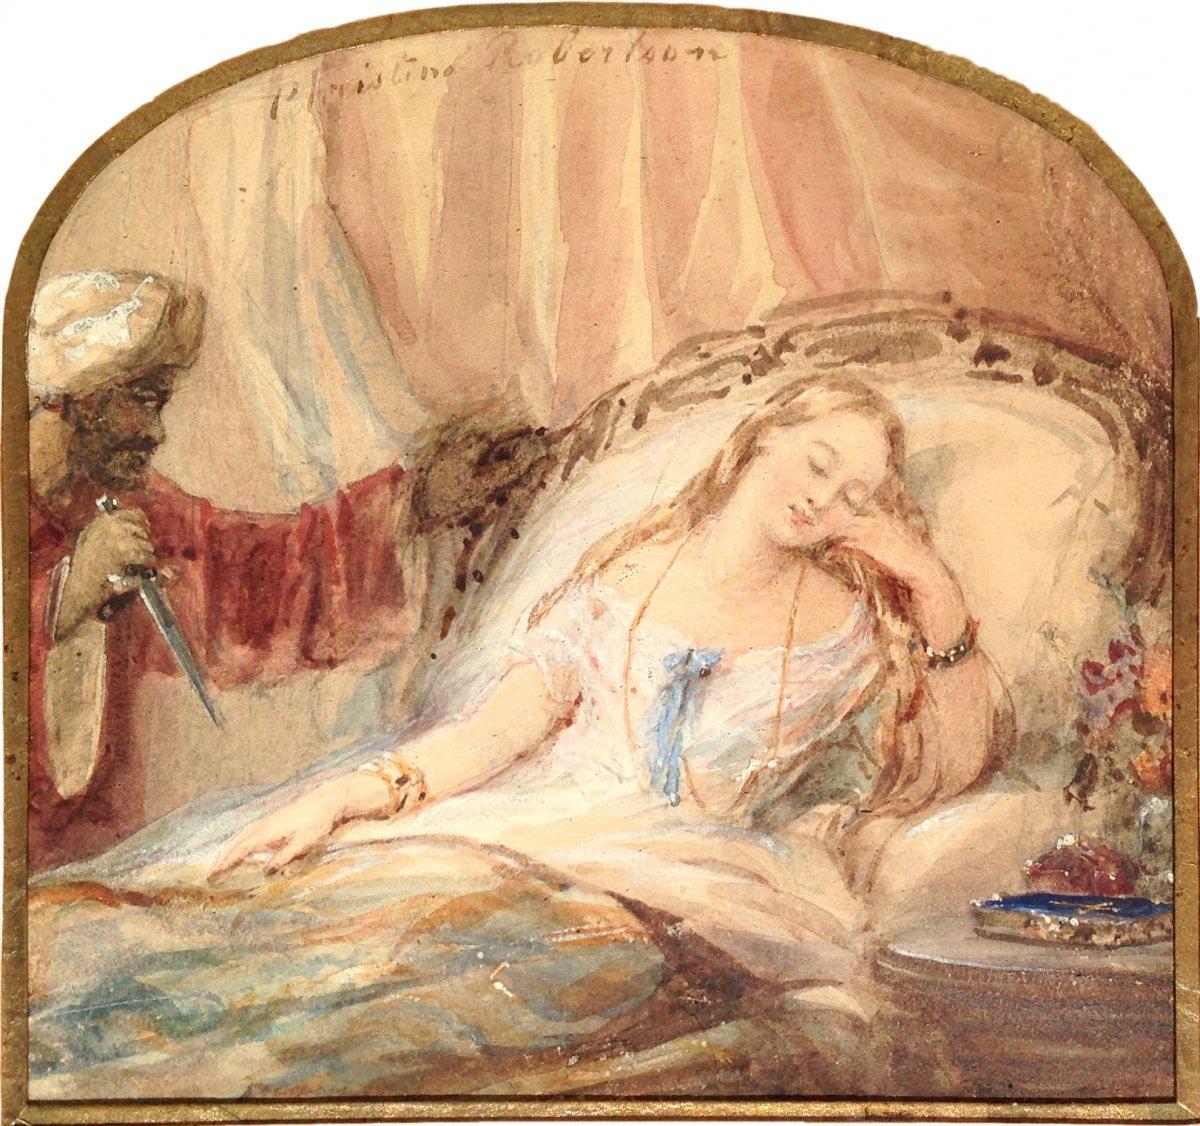 Christina Robertson (1796-1854) - Watercolor - Othello And Desdemona